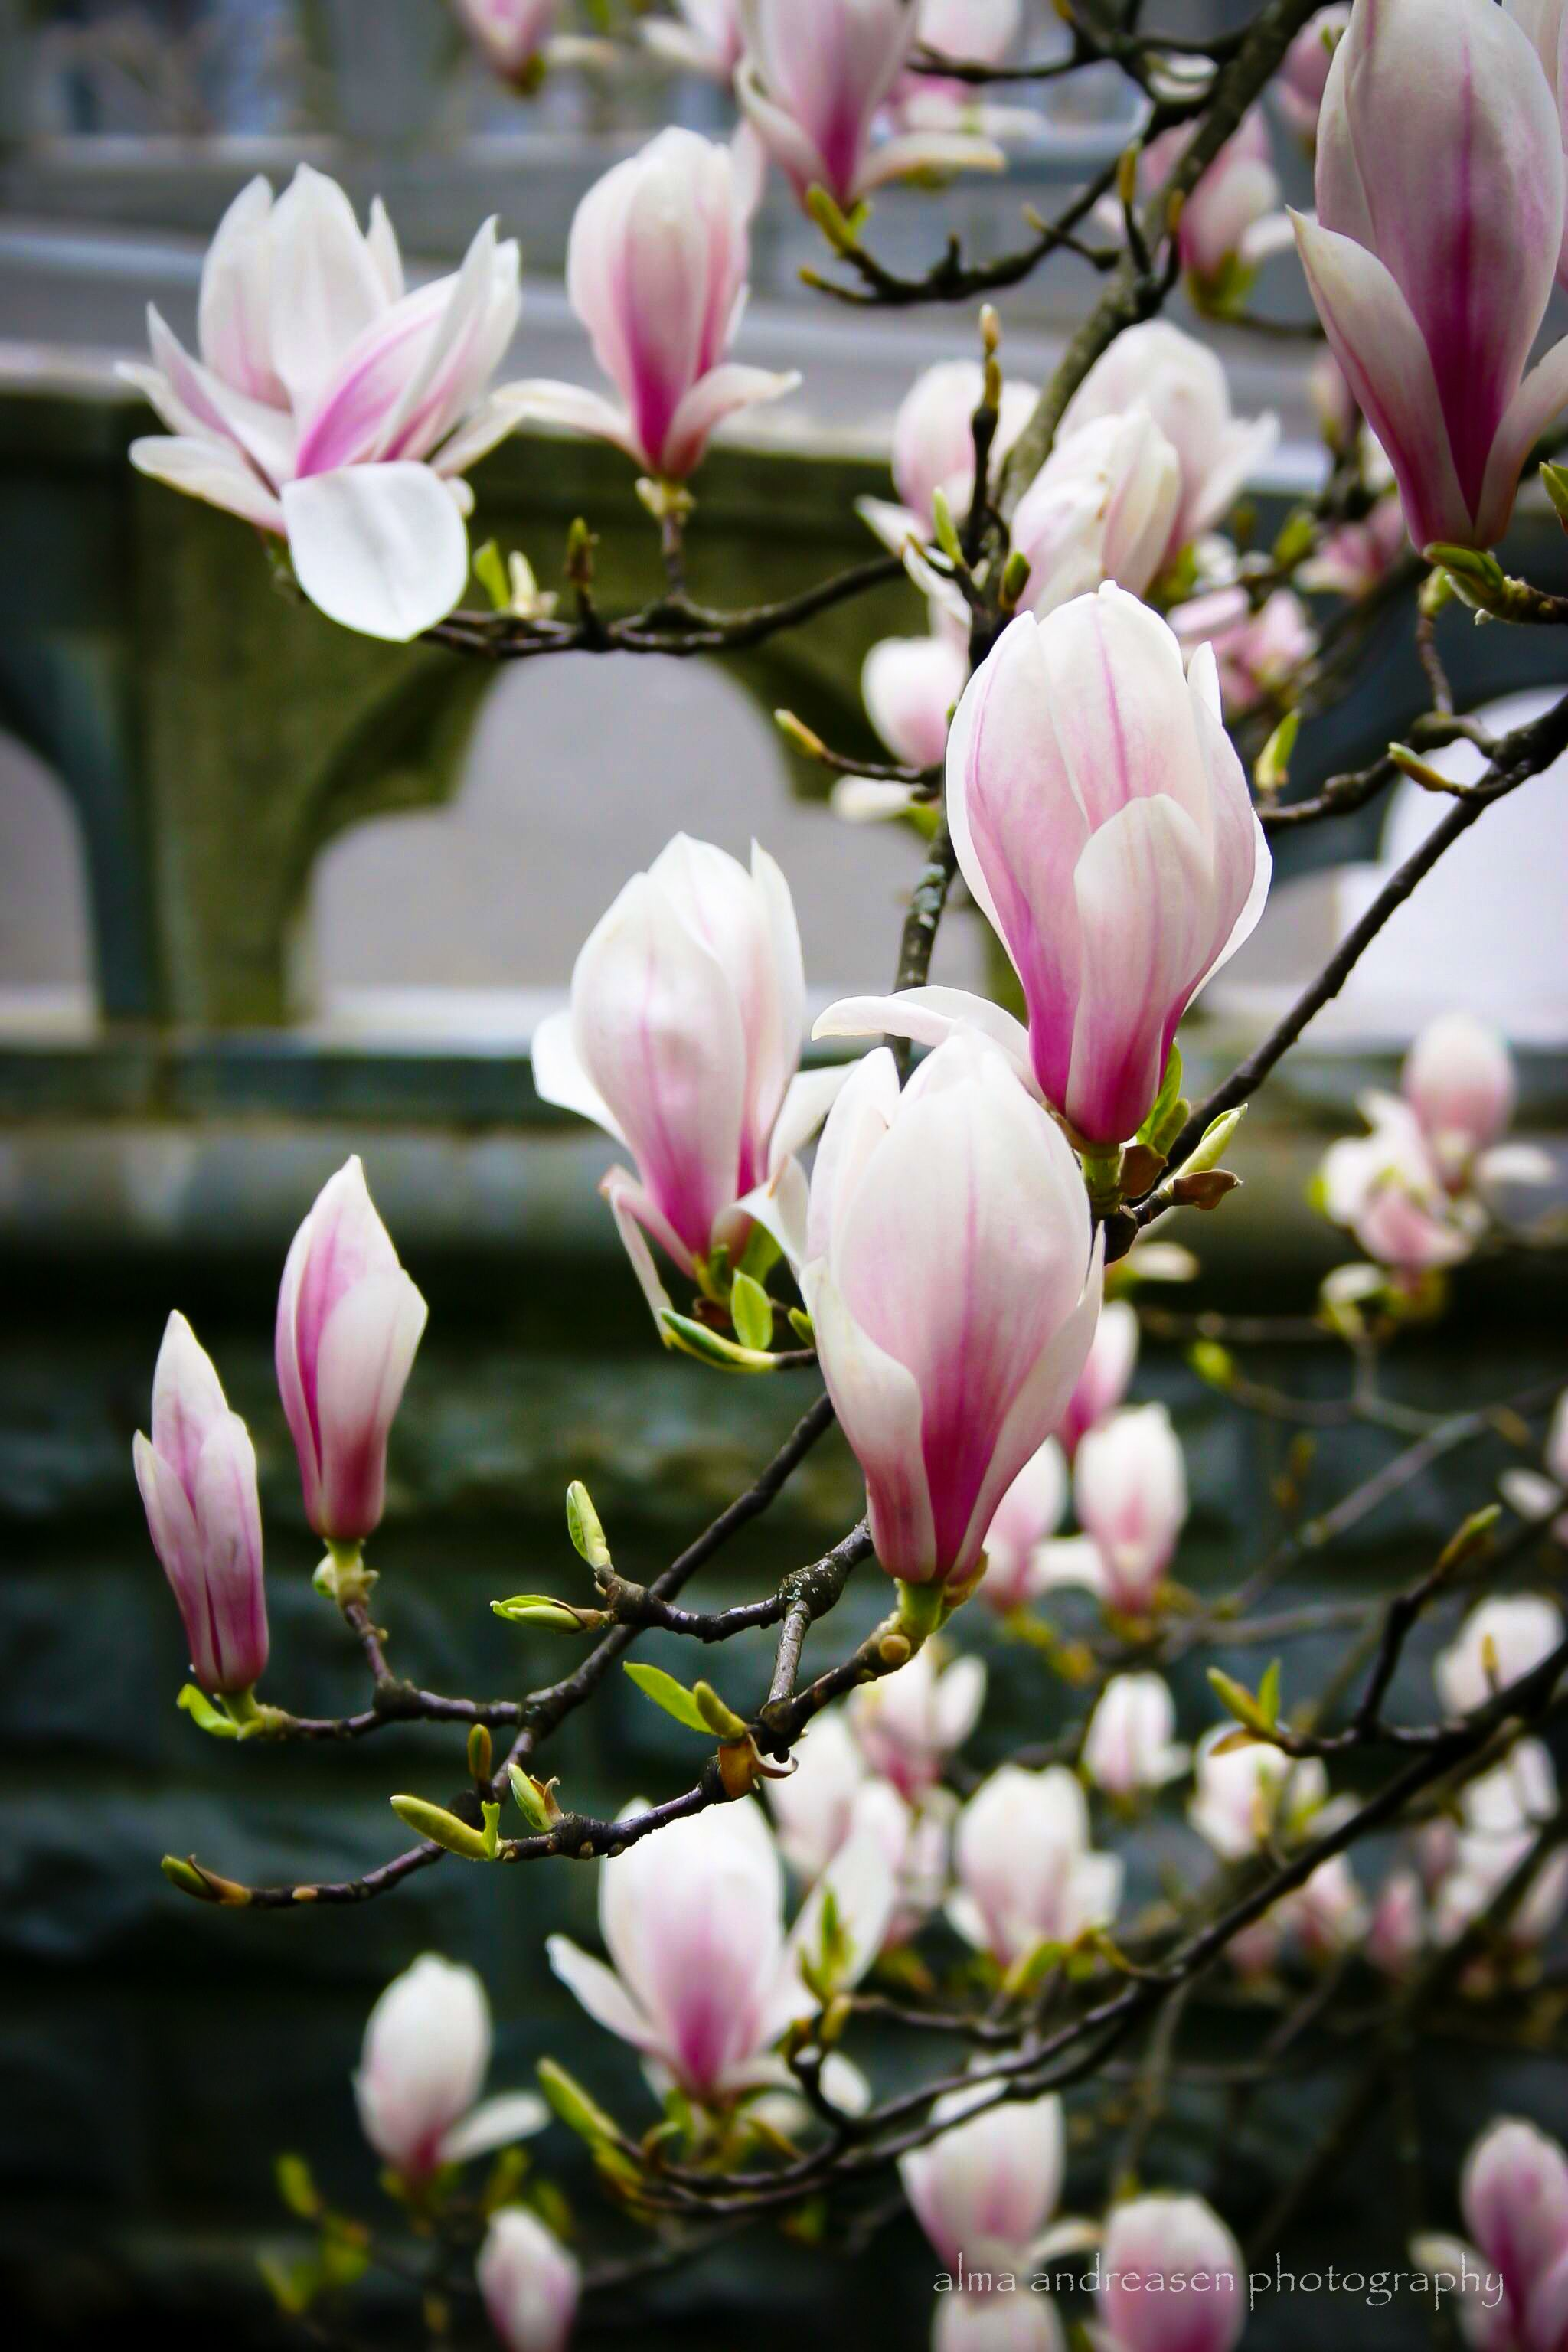 Magnolia. Alma Andreasen Photography. 꽃 사진, 수채화 꽃, 꽃